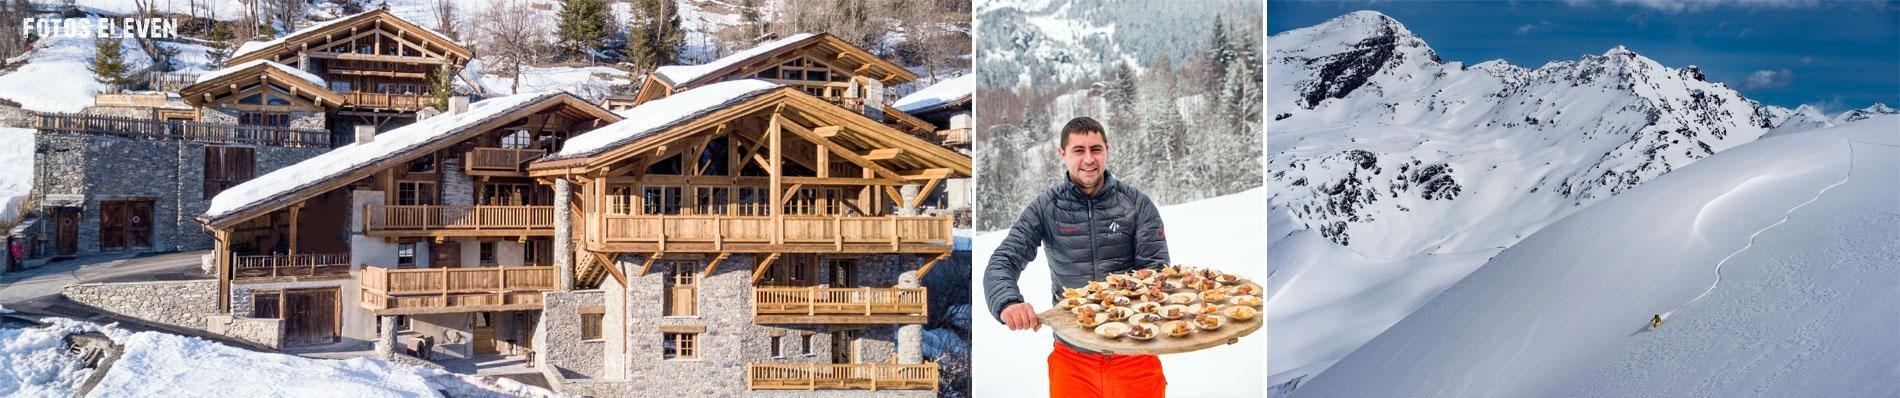 SKI-ELEVEN EXPERIENCE CHALET LE MIROIR HIBOU wintersport